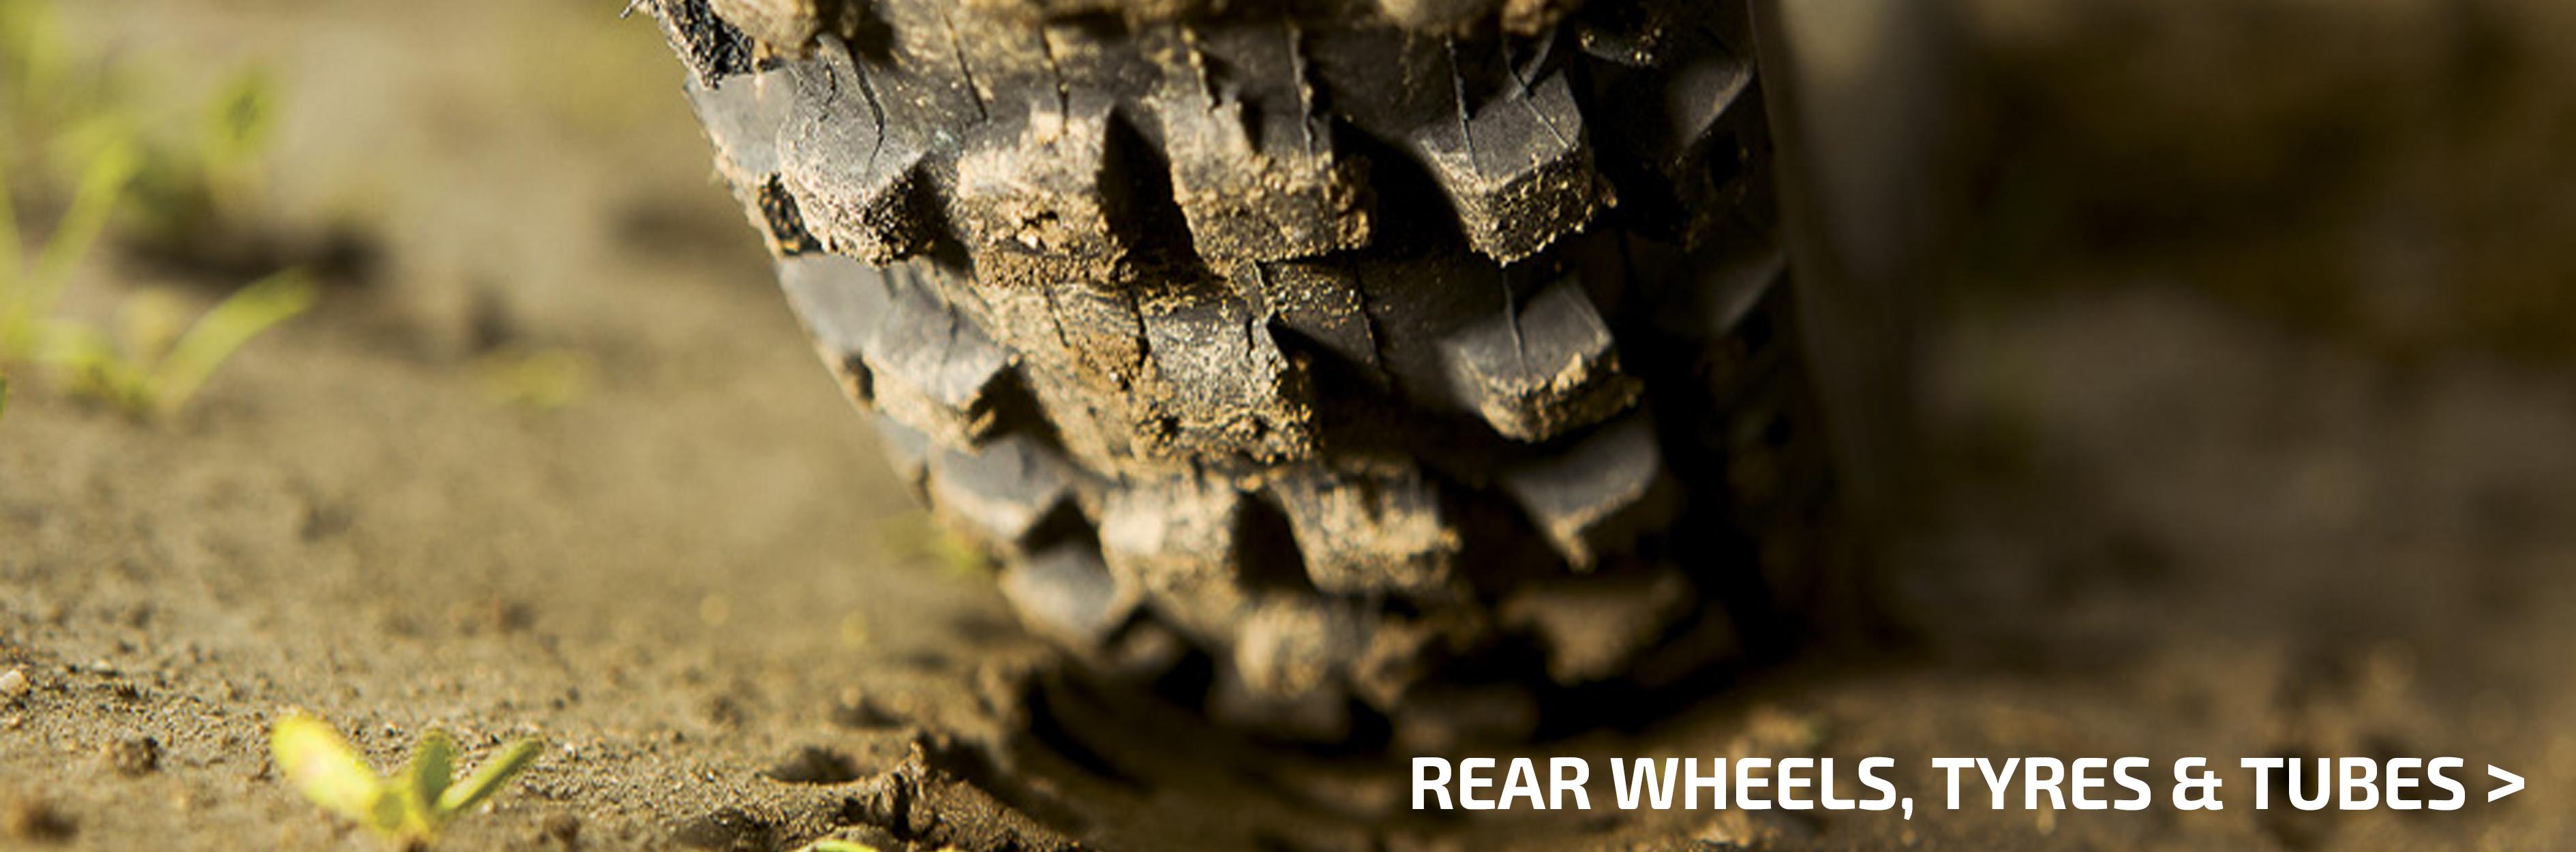 Rear wheels, tyres, tubes